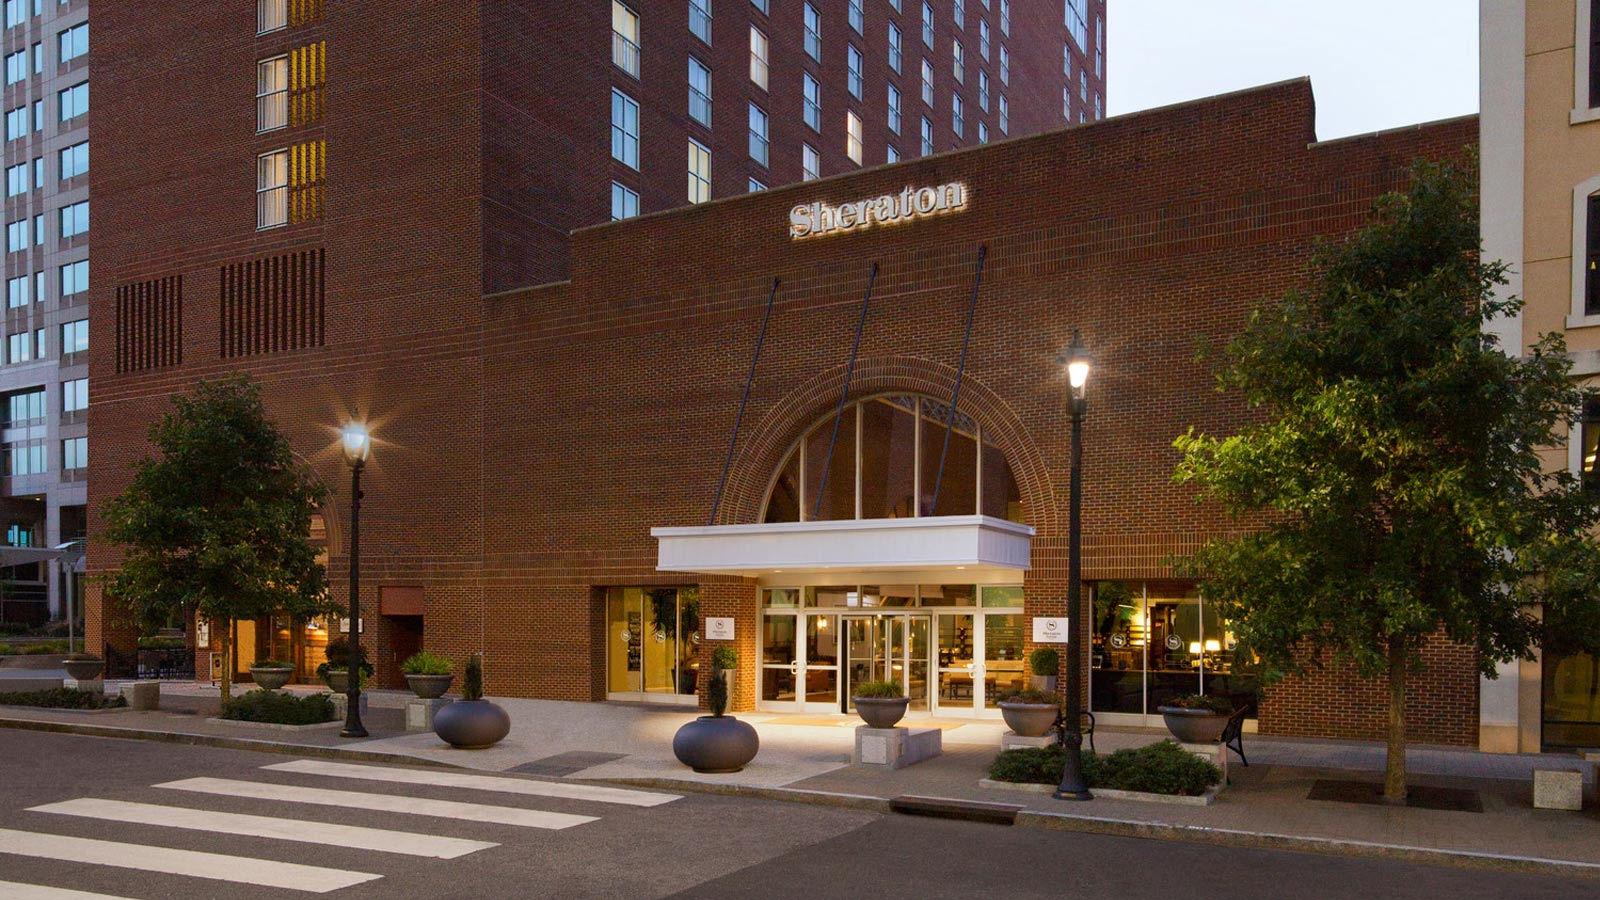 Sheraton Raleigh Hotel